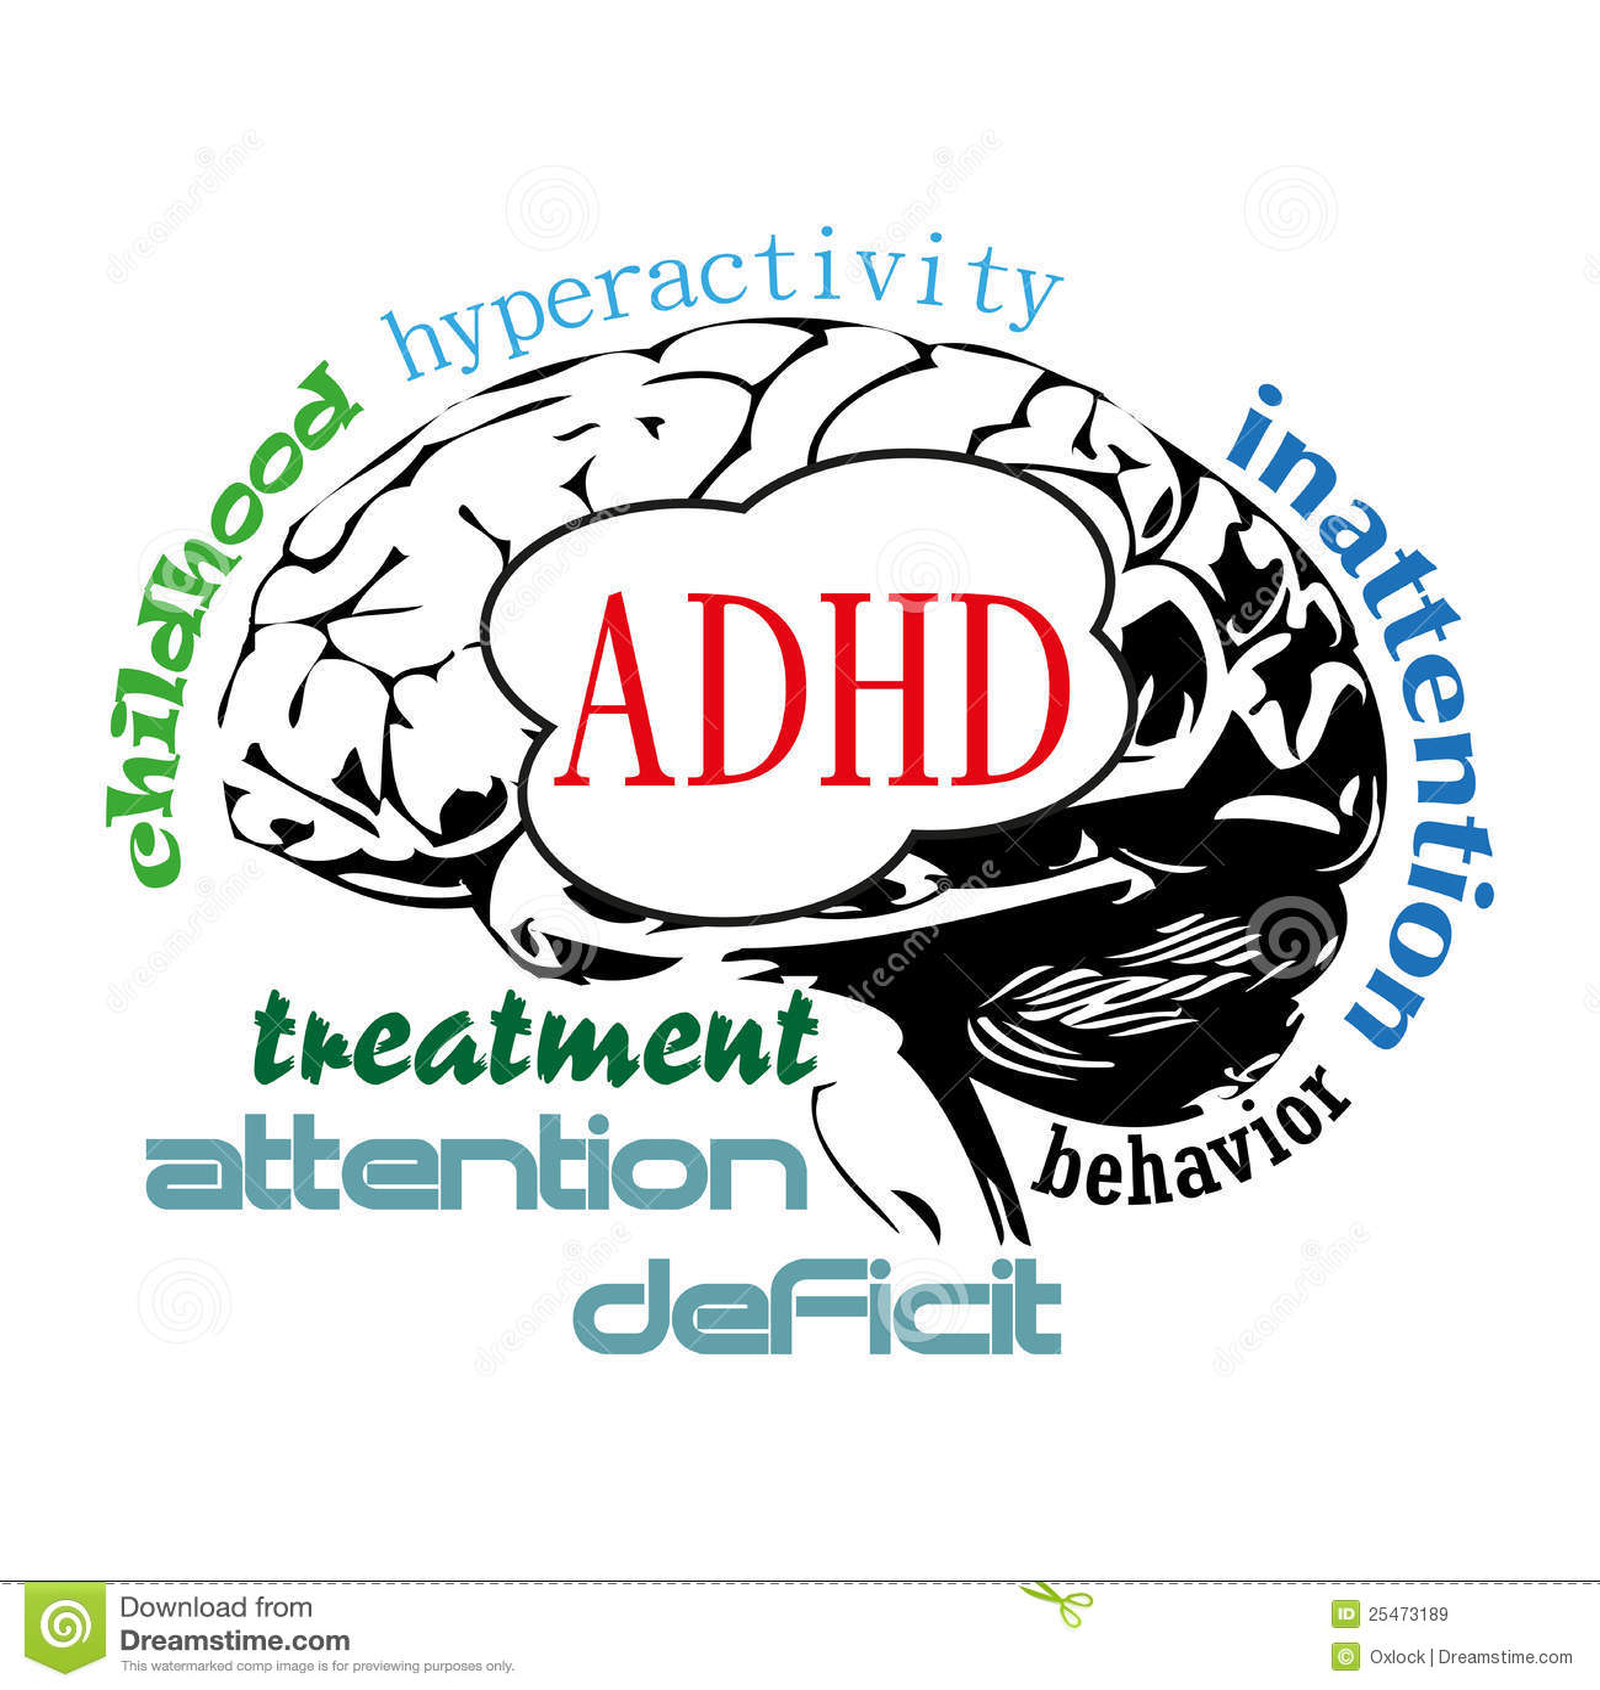 ADHD hersenenconcept